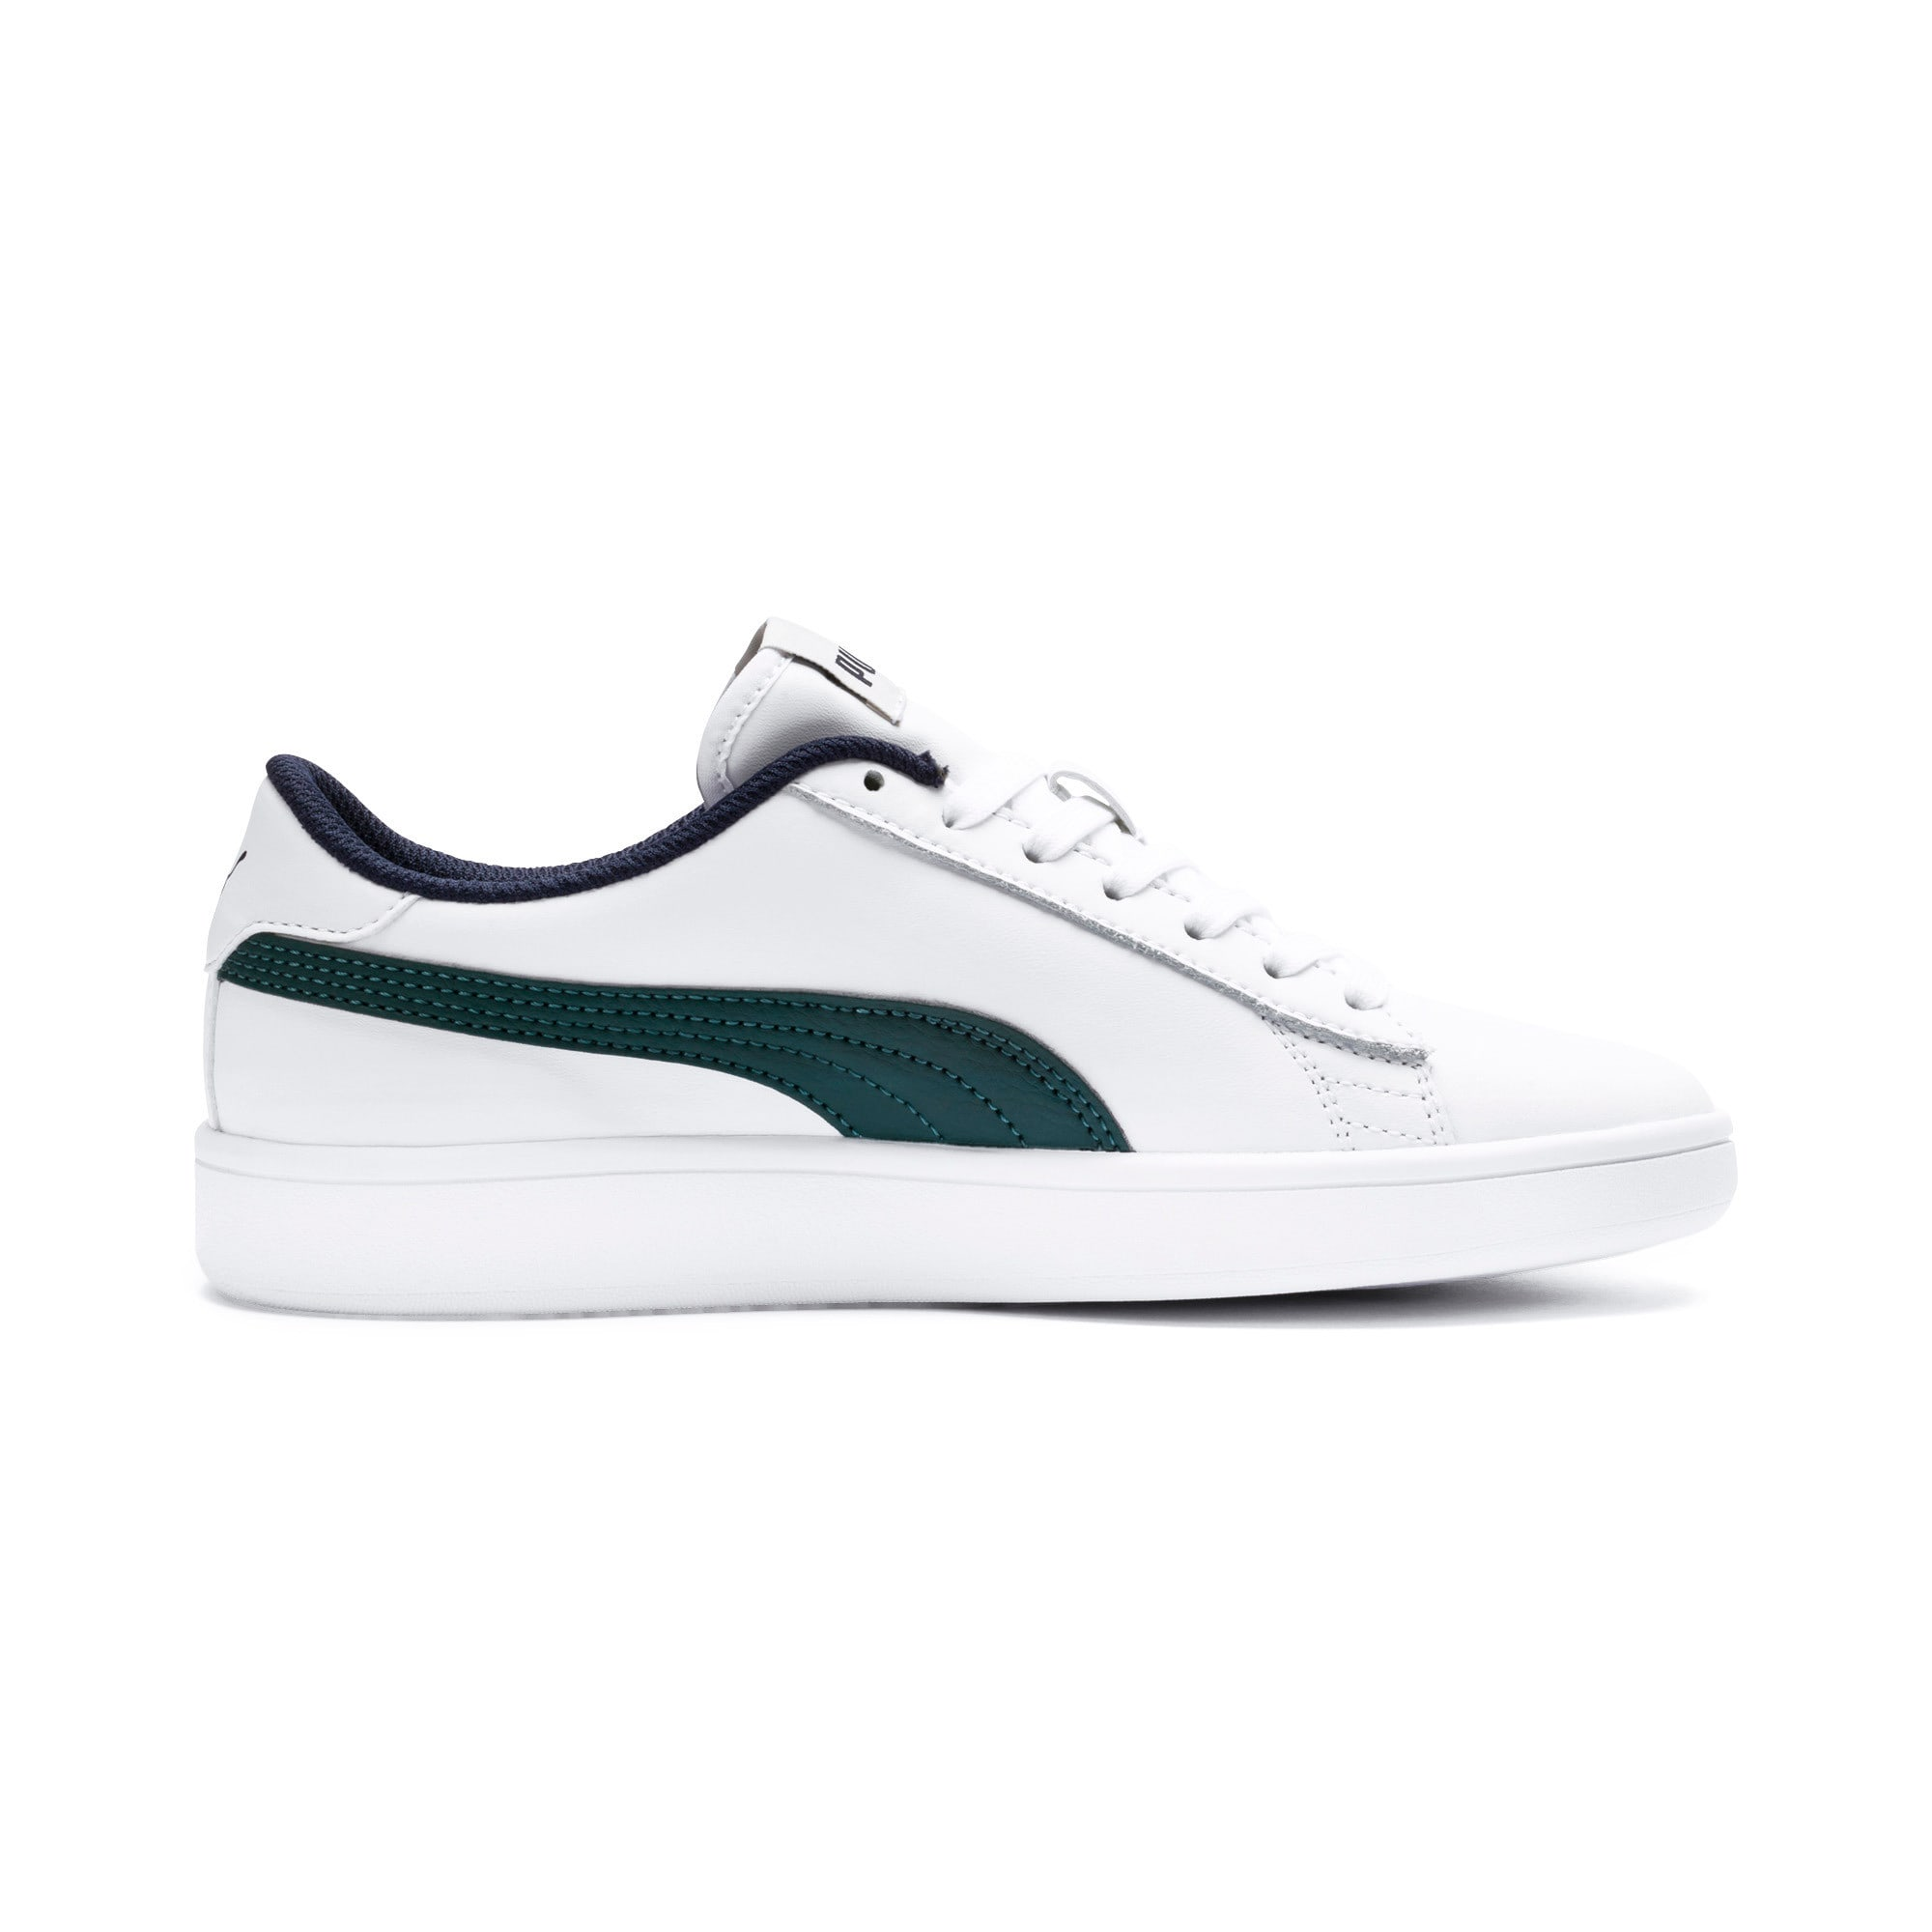 Thumbnail 5 of PUMA Smash v2 Youth Sneaker, Puma White-Ponderosa Pine, medium